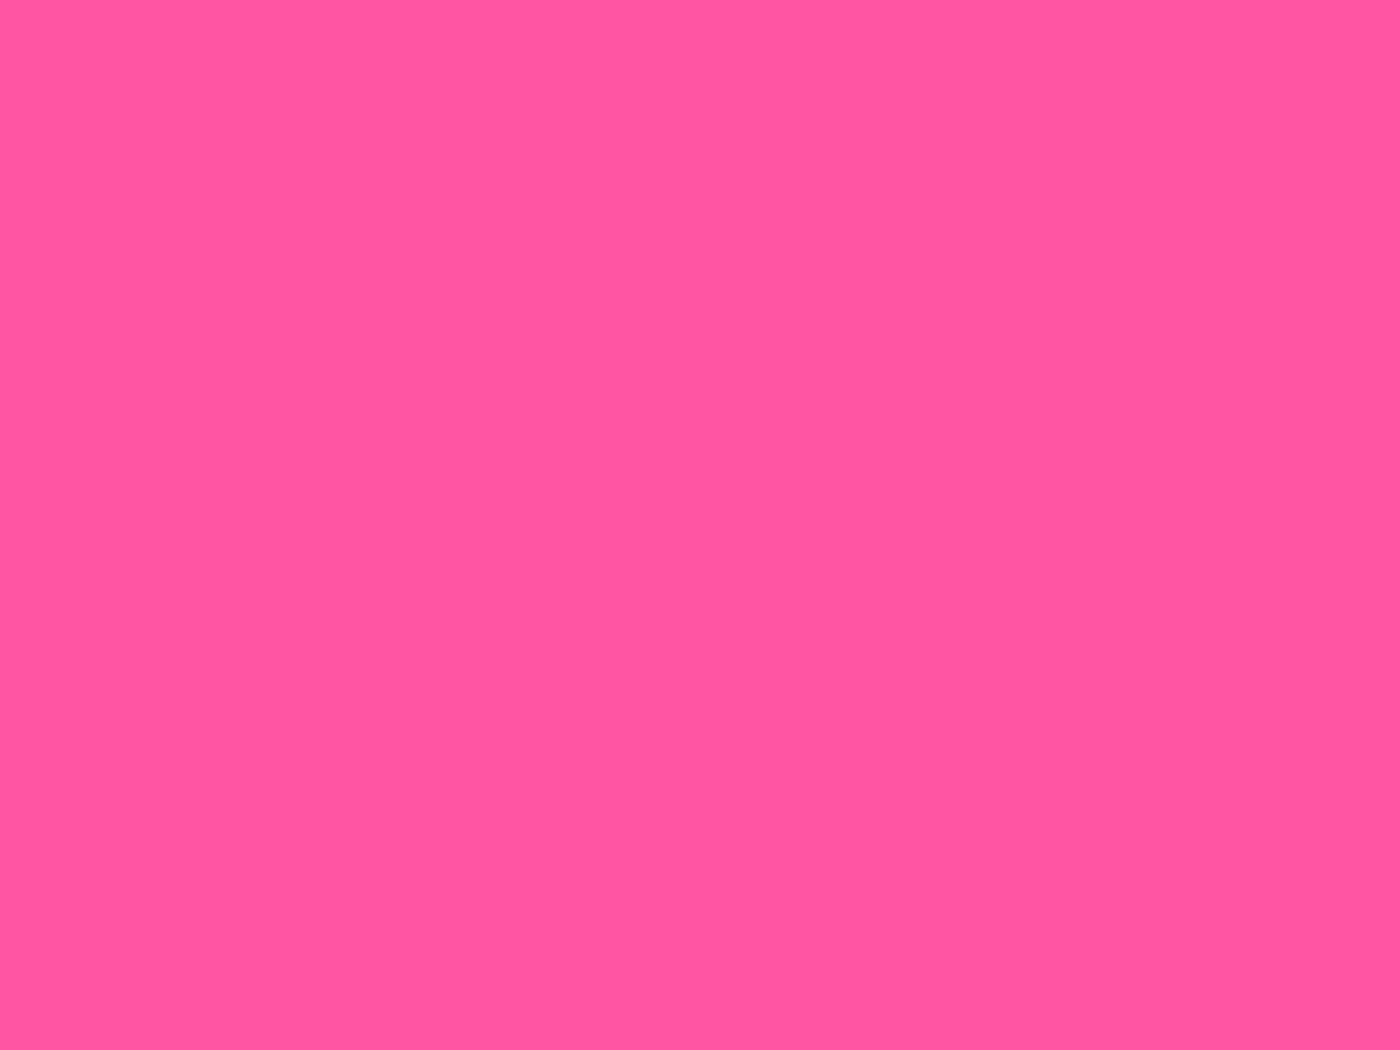 1400x1050 Brilliant Rose Solid Color Background